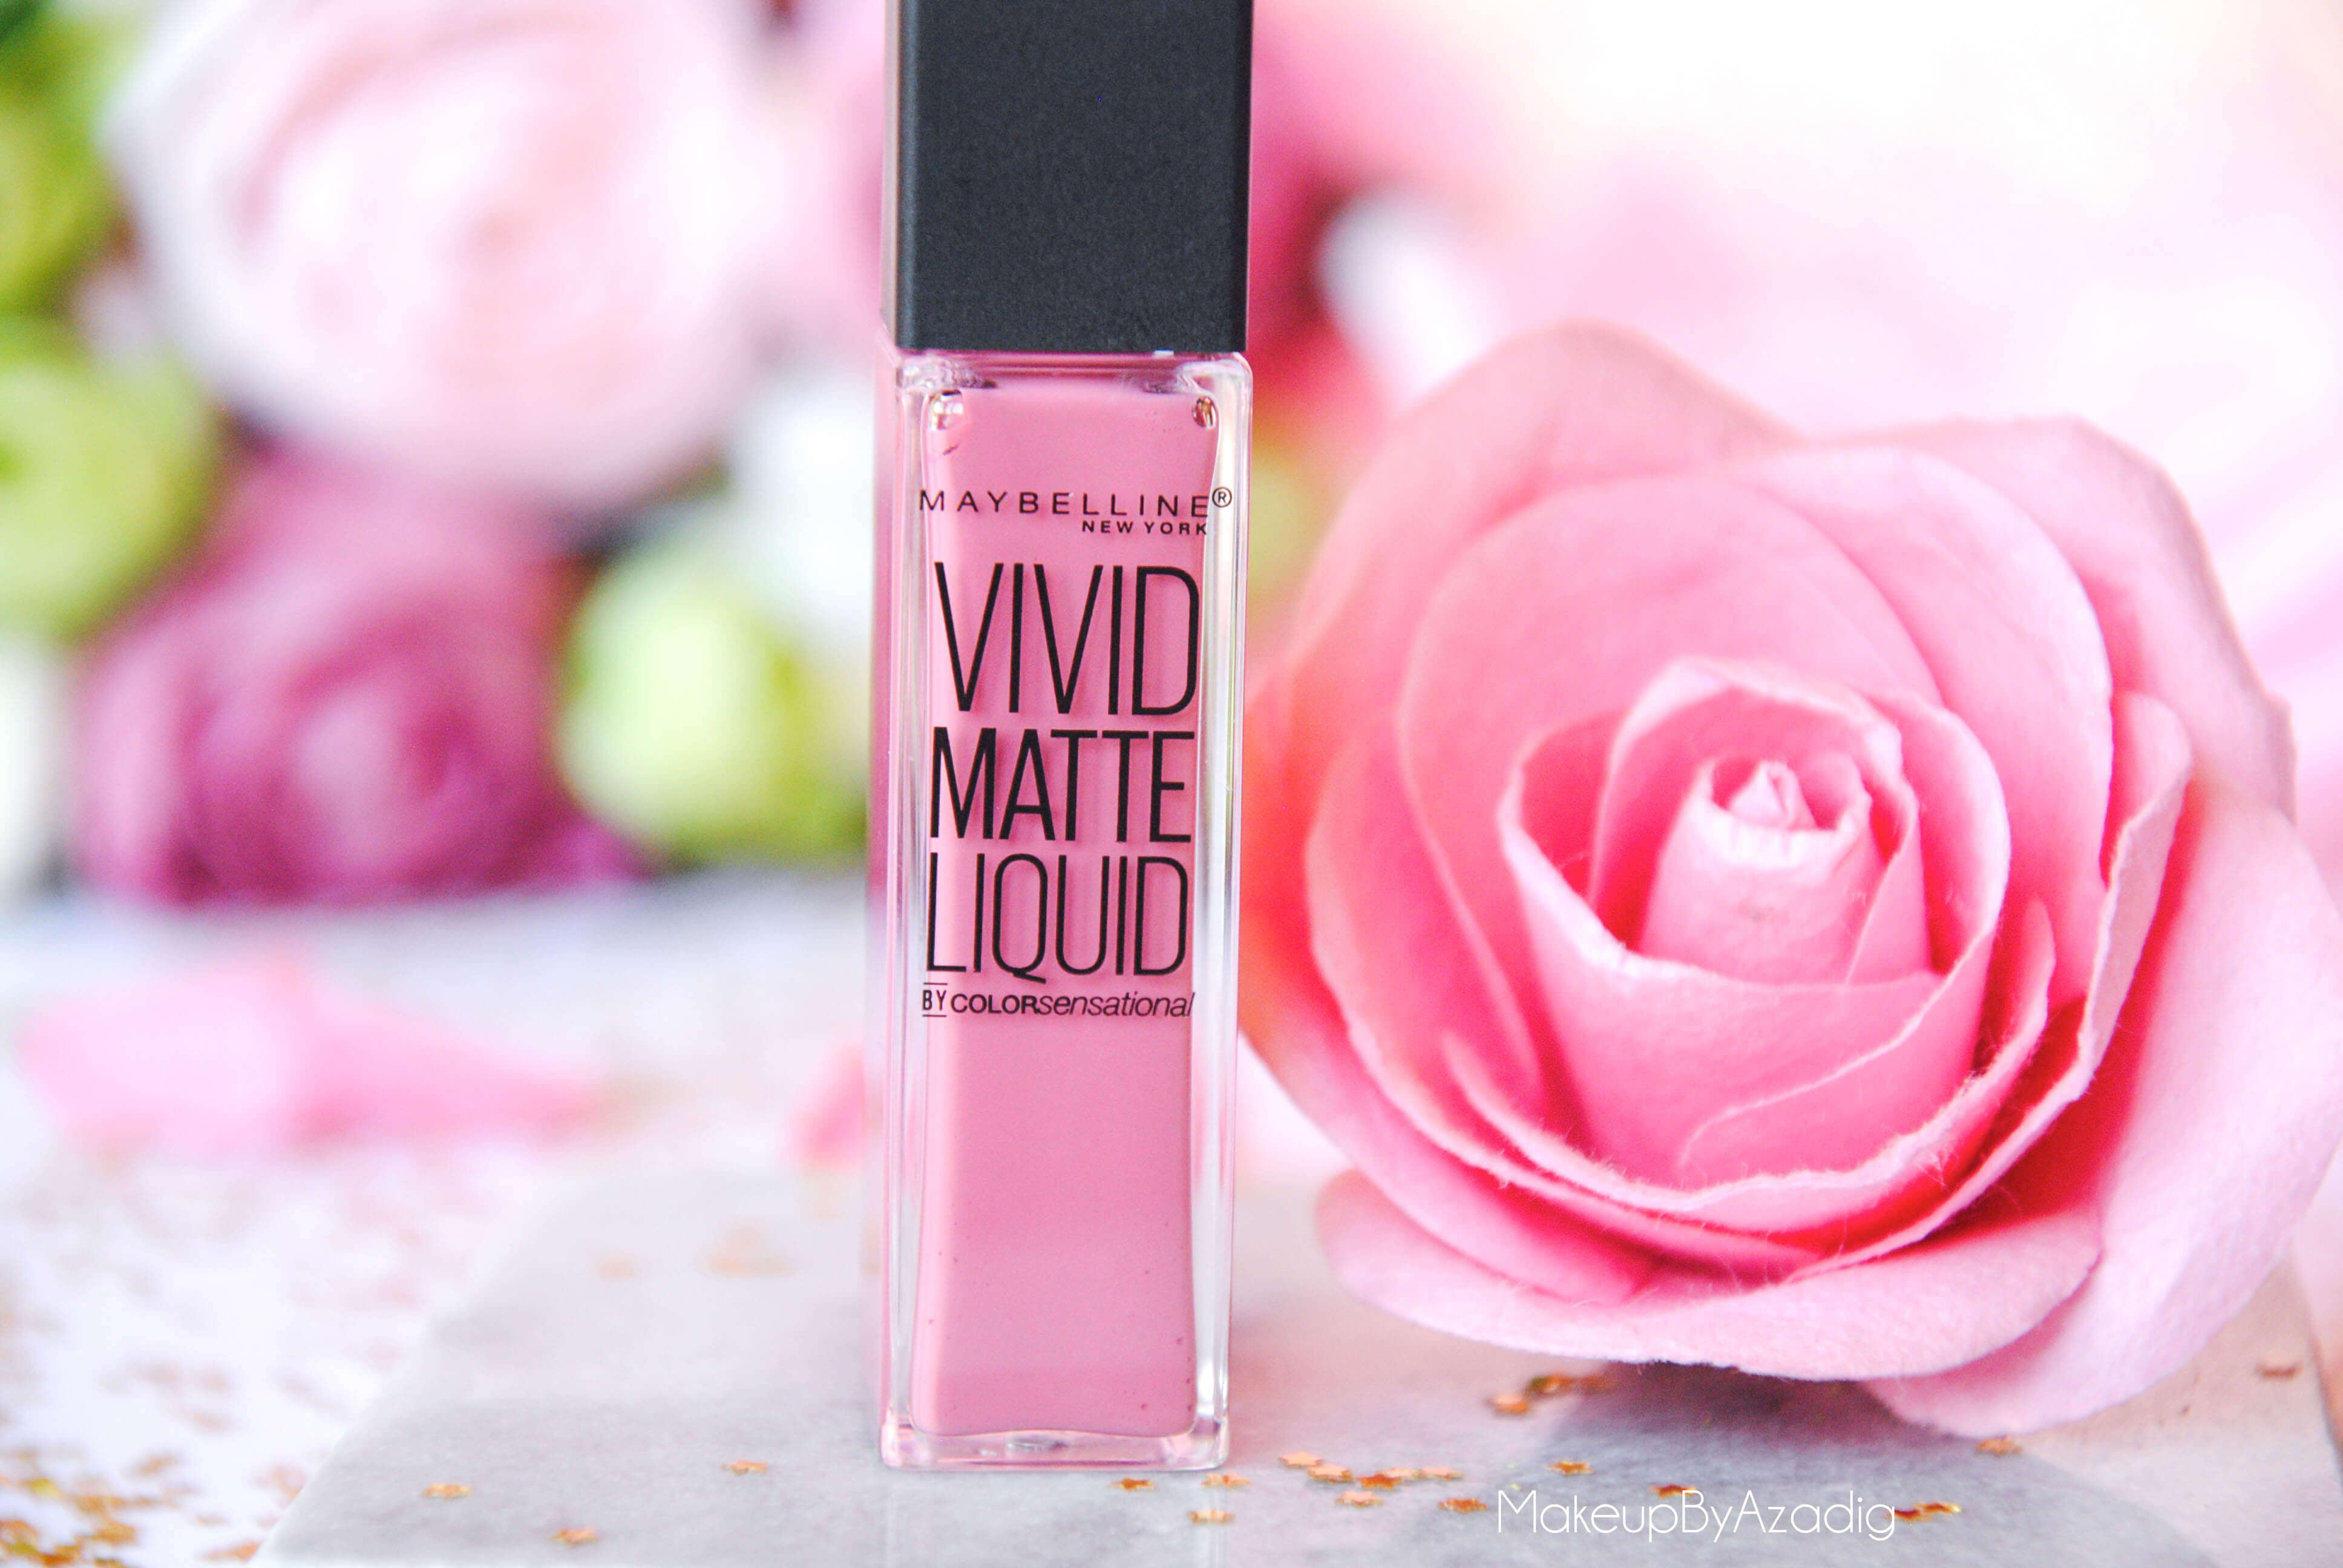 makeupbyazadig-troyes-gemey-maybelline-new-york-nude-flush-orange-shot-possessed-plum-berry-boost-fuchsia-ecstasy-corail-courage-vivid-matte-liquid-by-colorsensational-nude